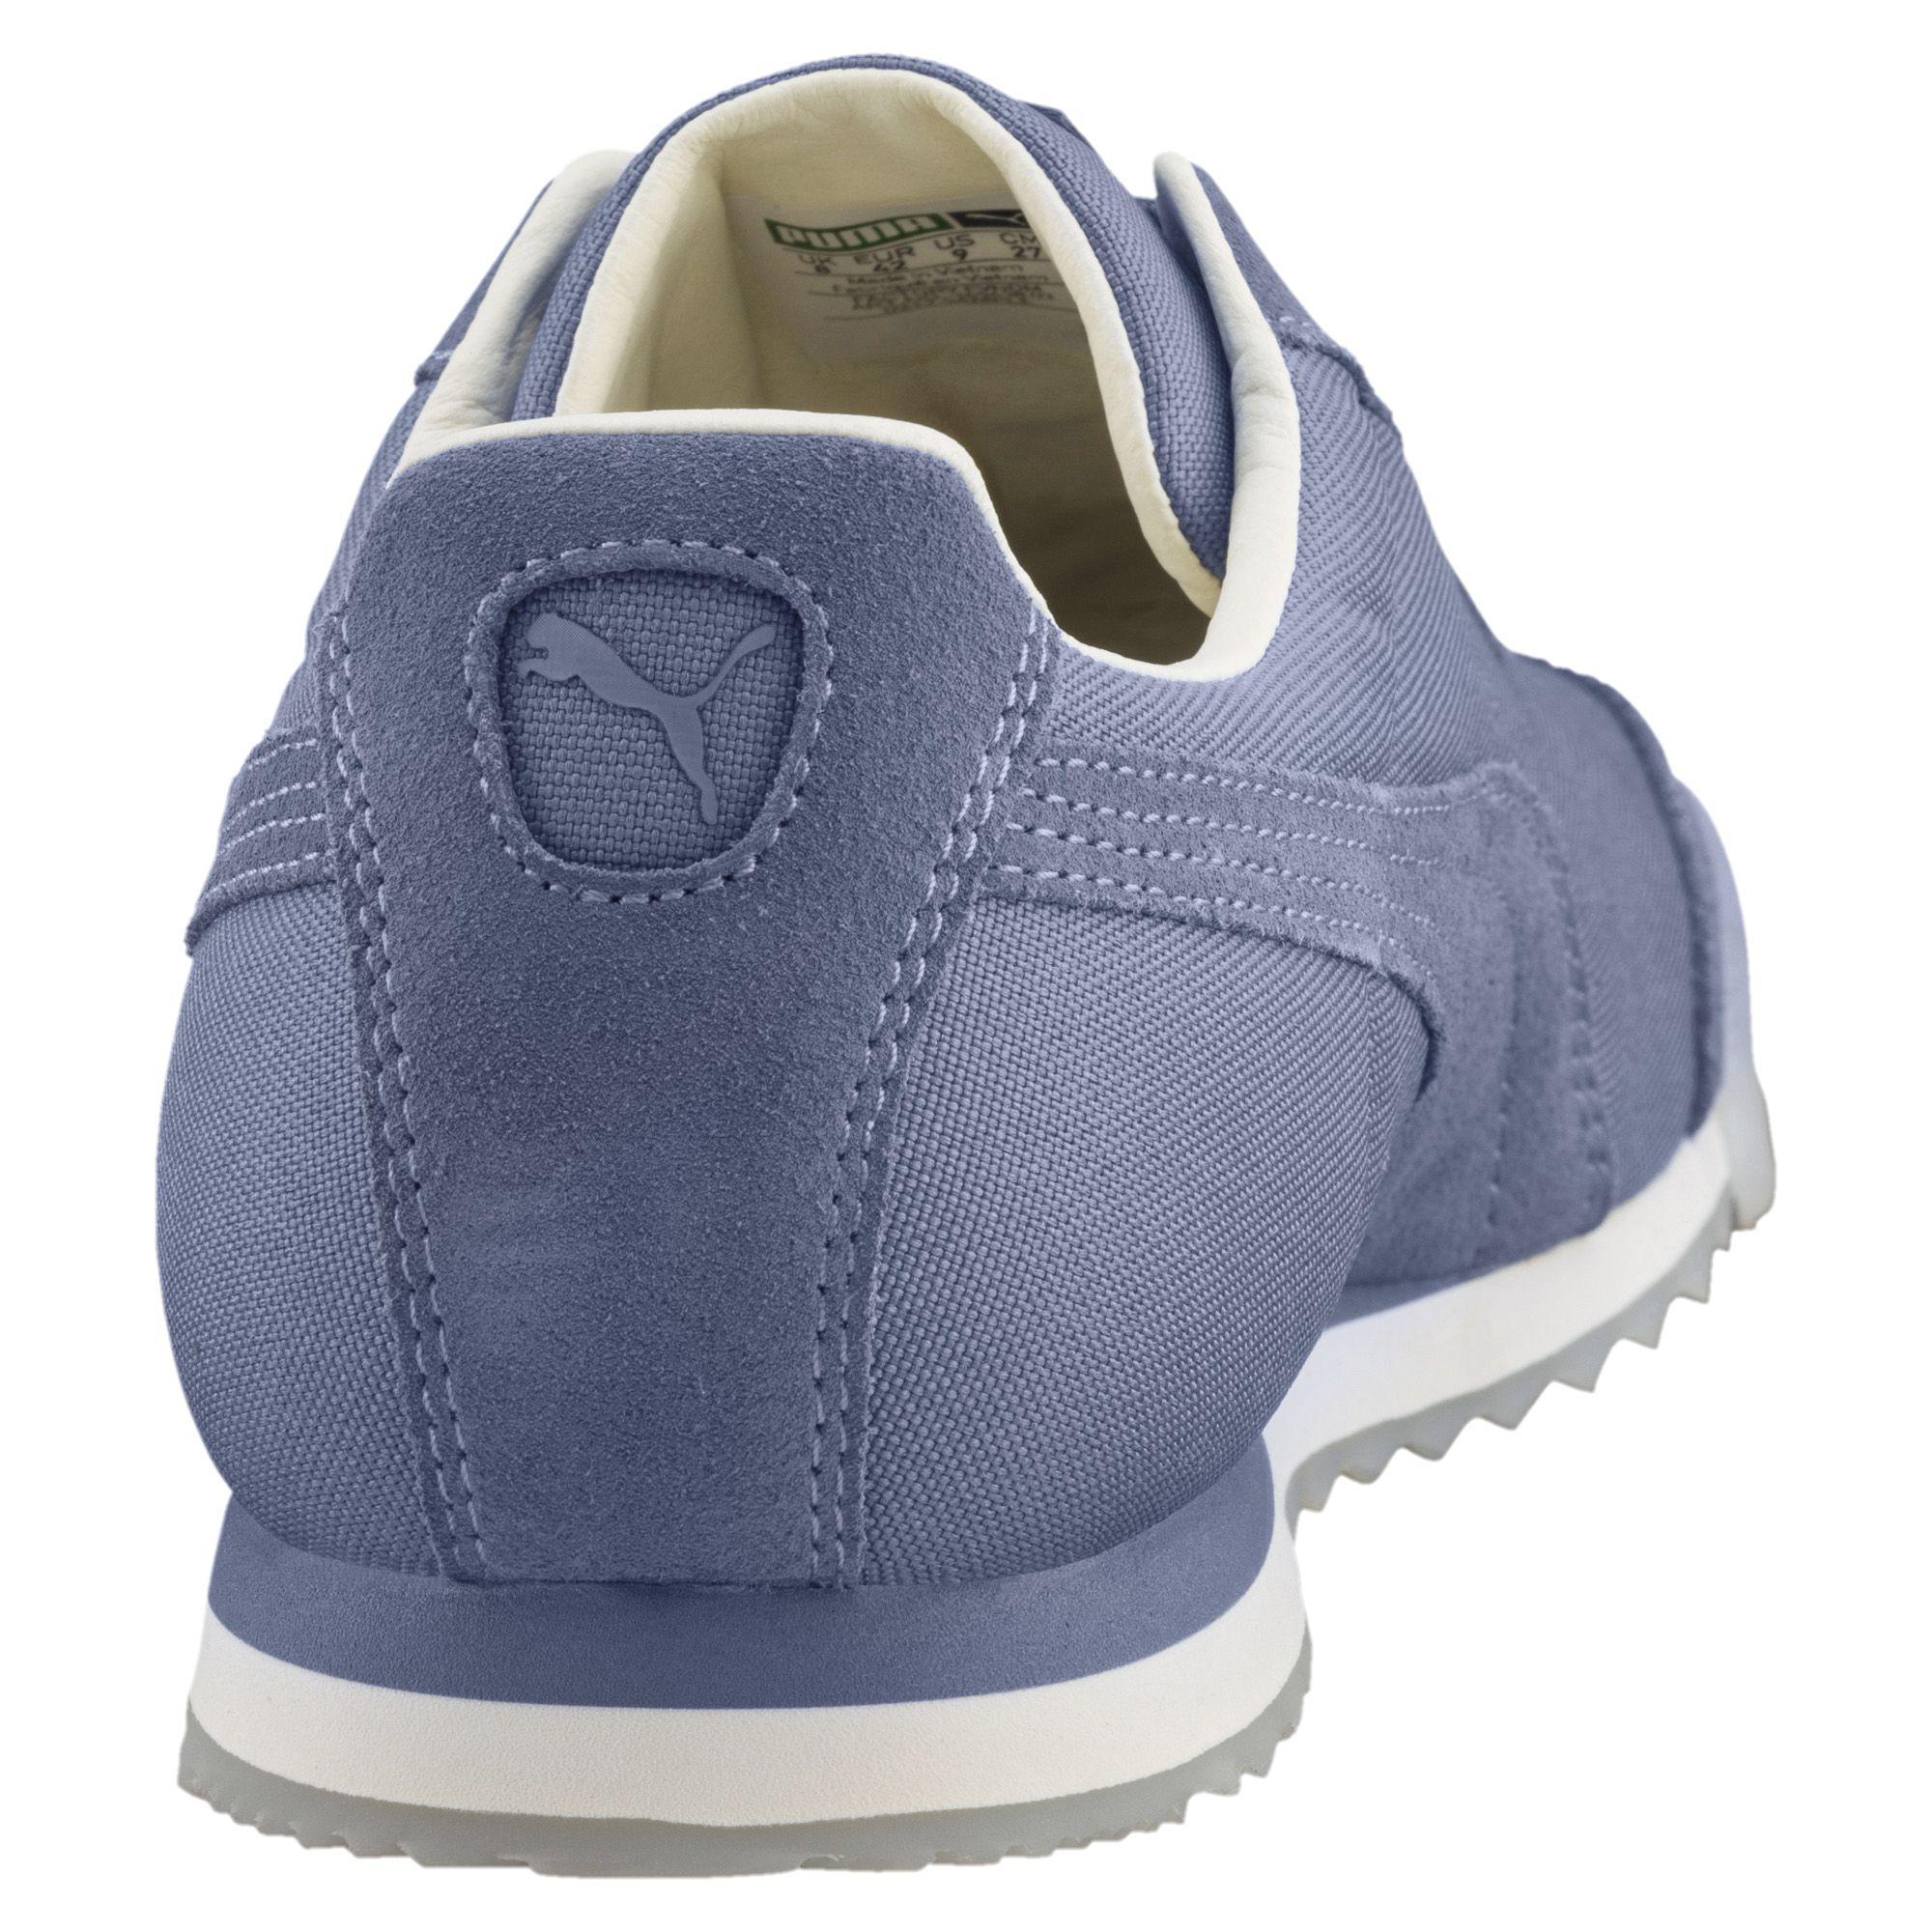 8da1fafaafe Lyst - PUMA Roma Summer Sneakers in Blue for Men